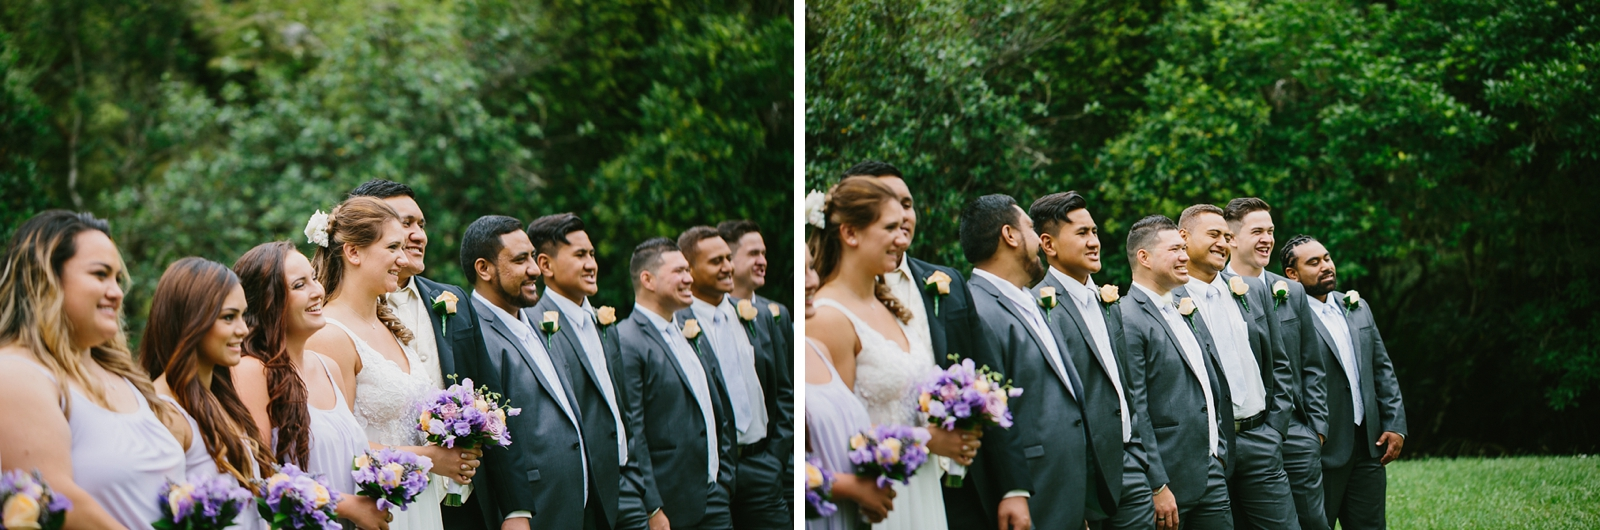 GabbyFiti_Auckland Wedding Photographer_Patty Lagera_0038.jpg